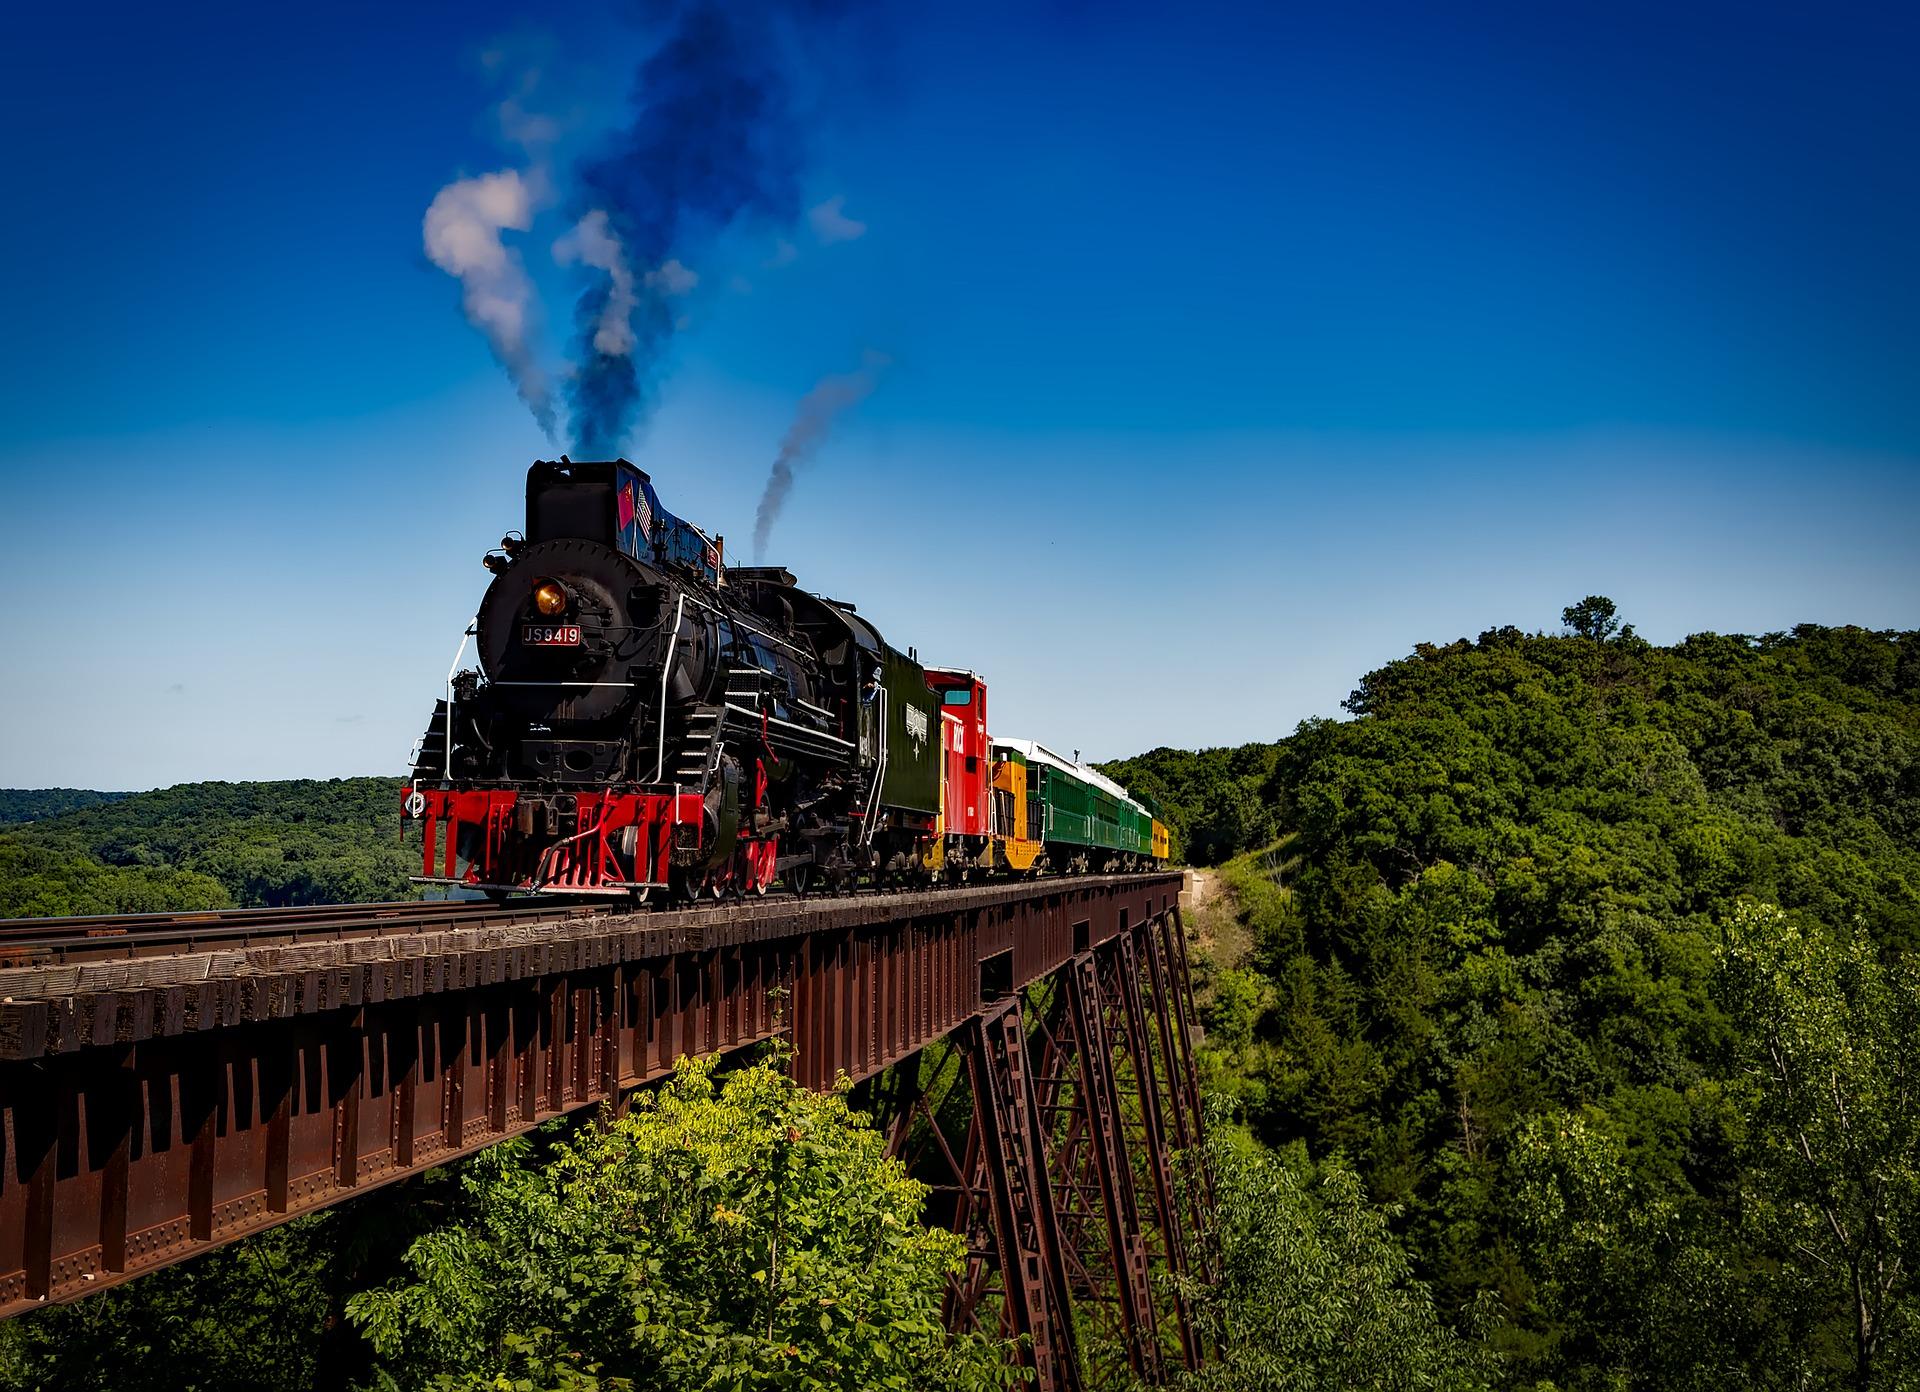 train-1728537_1920_1556057991760.jpg